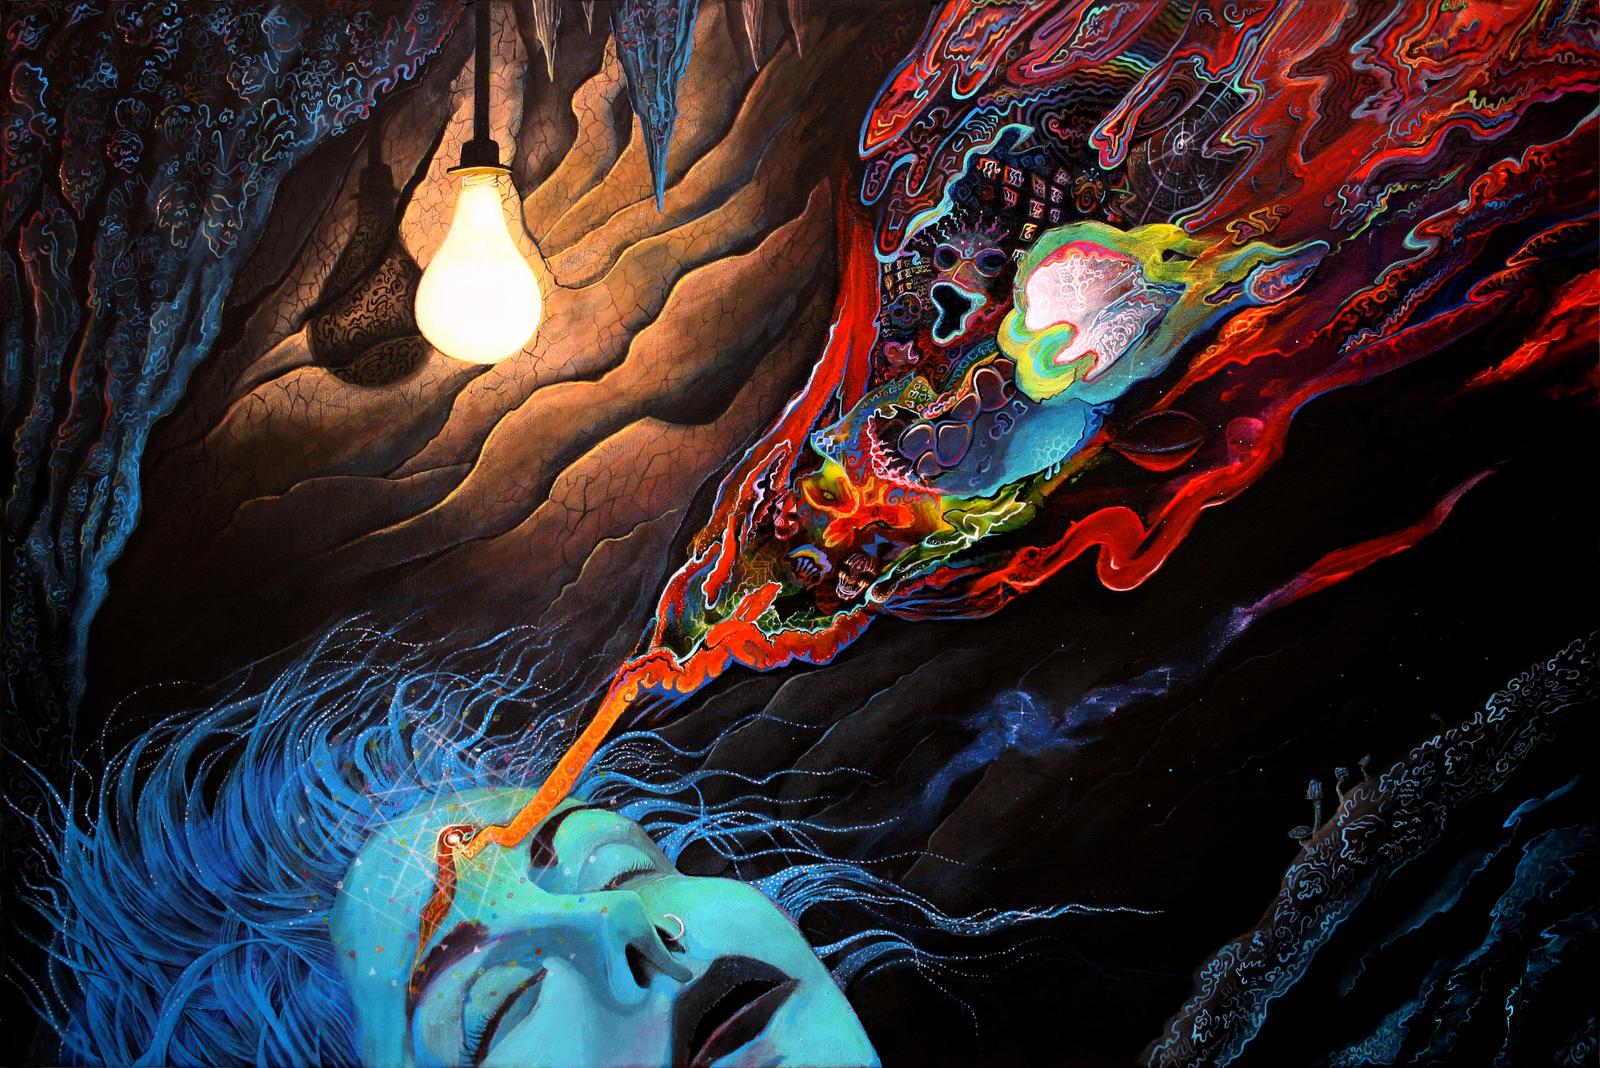 Turn the light on by SteveGriffith